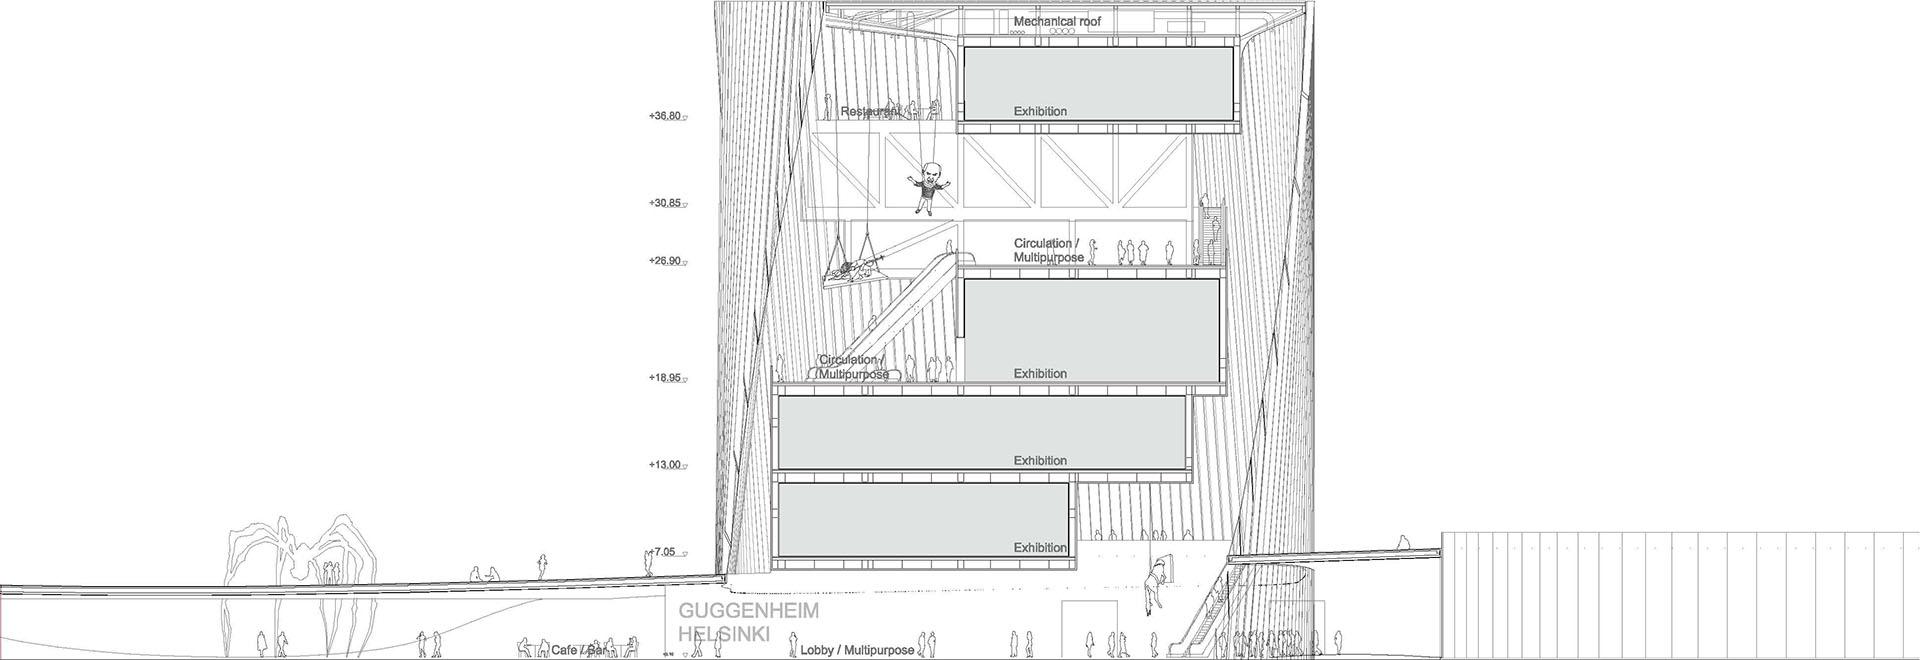 03-PLAYstudio_Guggenheim-Helsinki_Sección